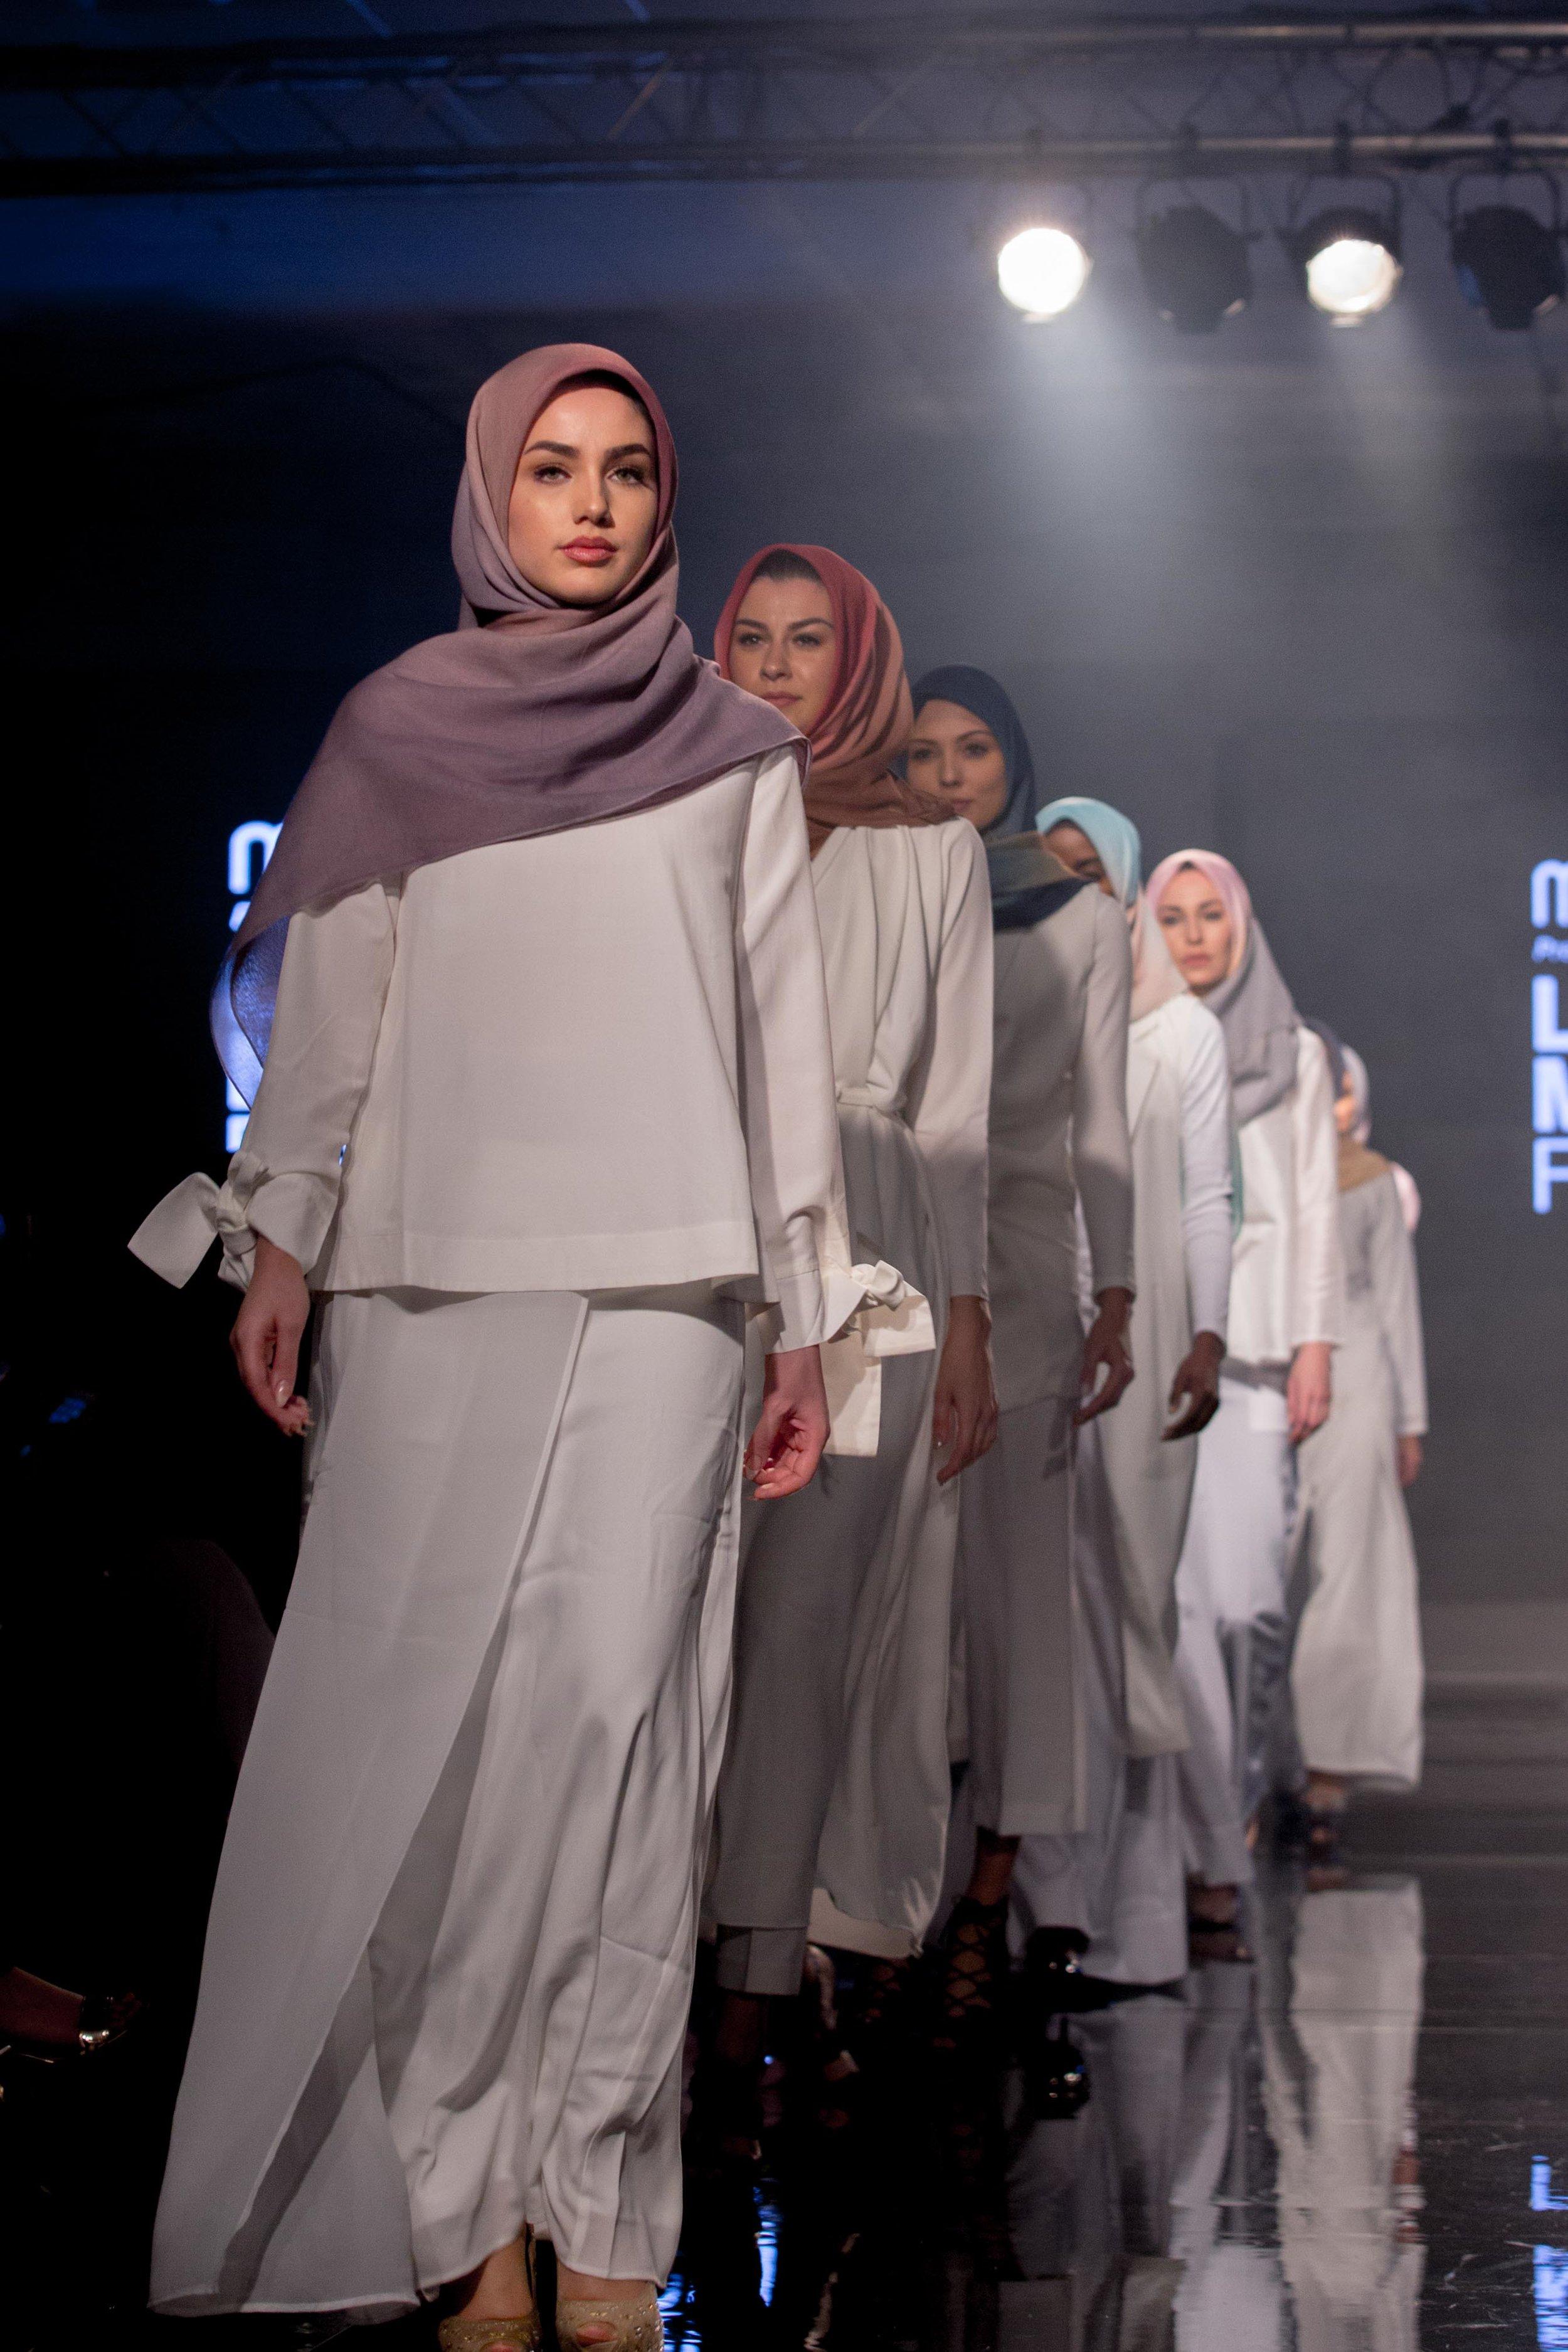 Aidijuma-London-Modest-Fashion-Week-catwalk-photographer-natalia-smith-photography-3.jpg